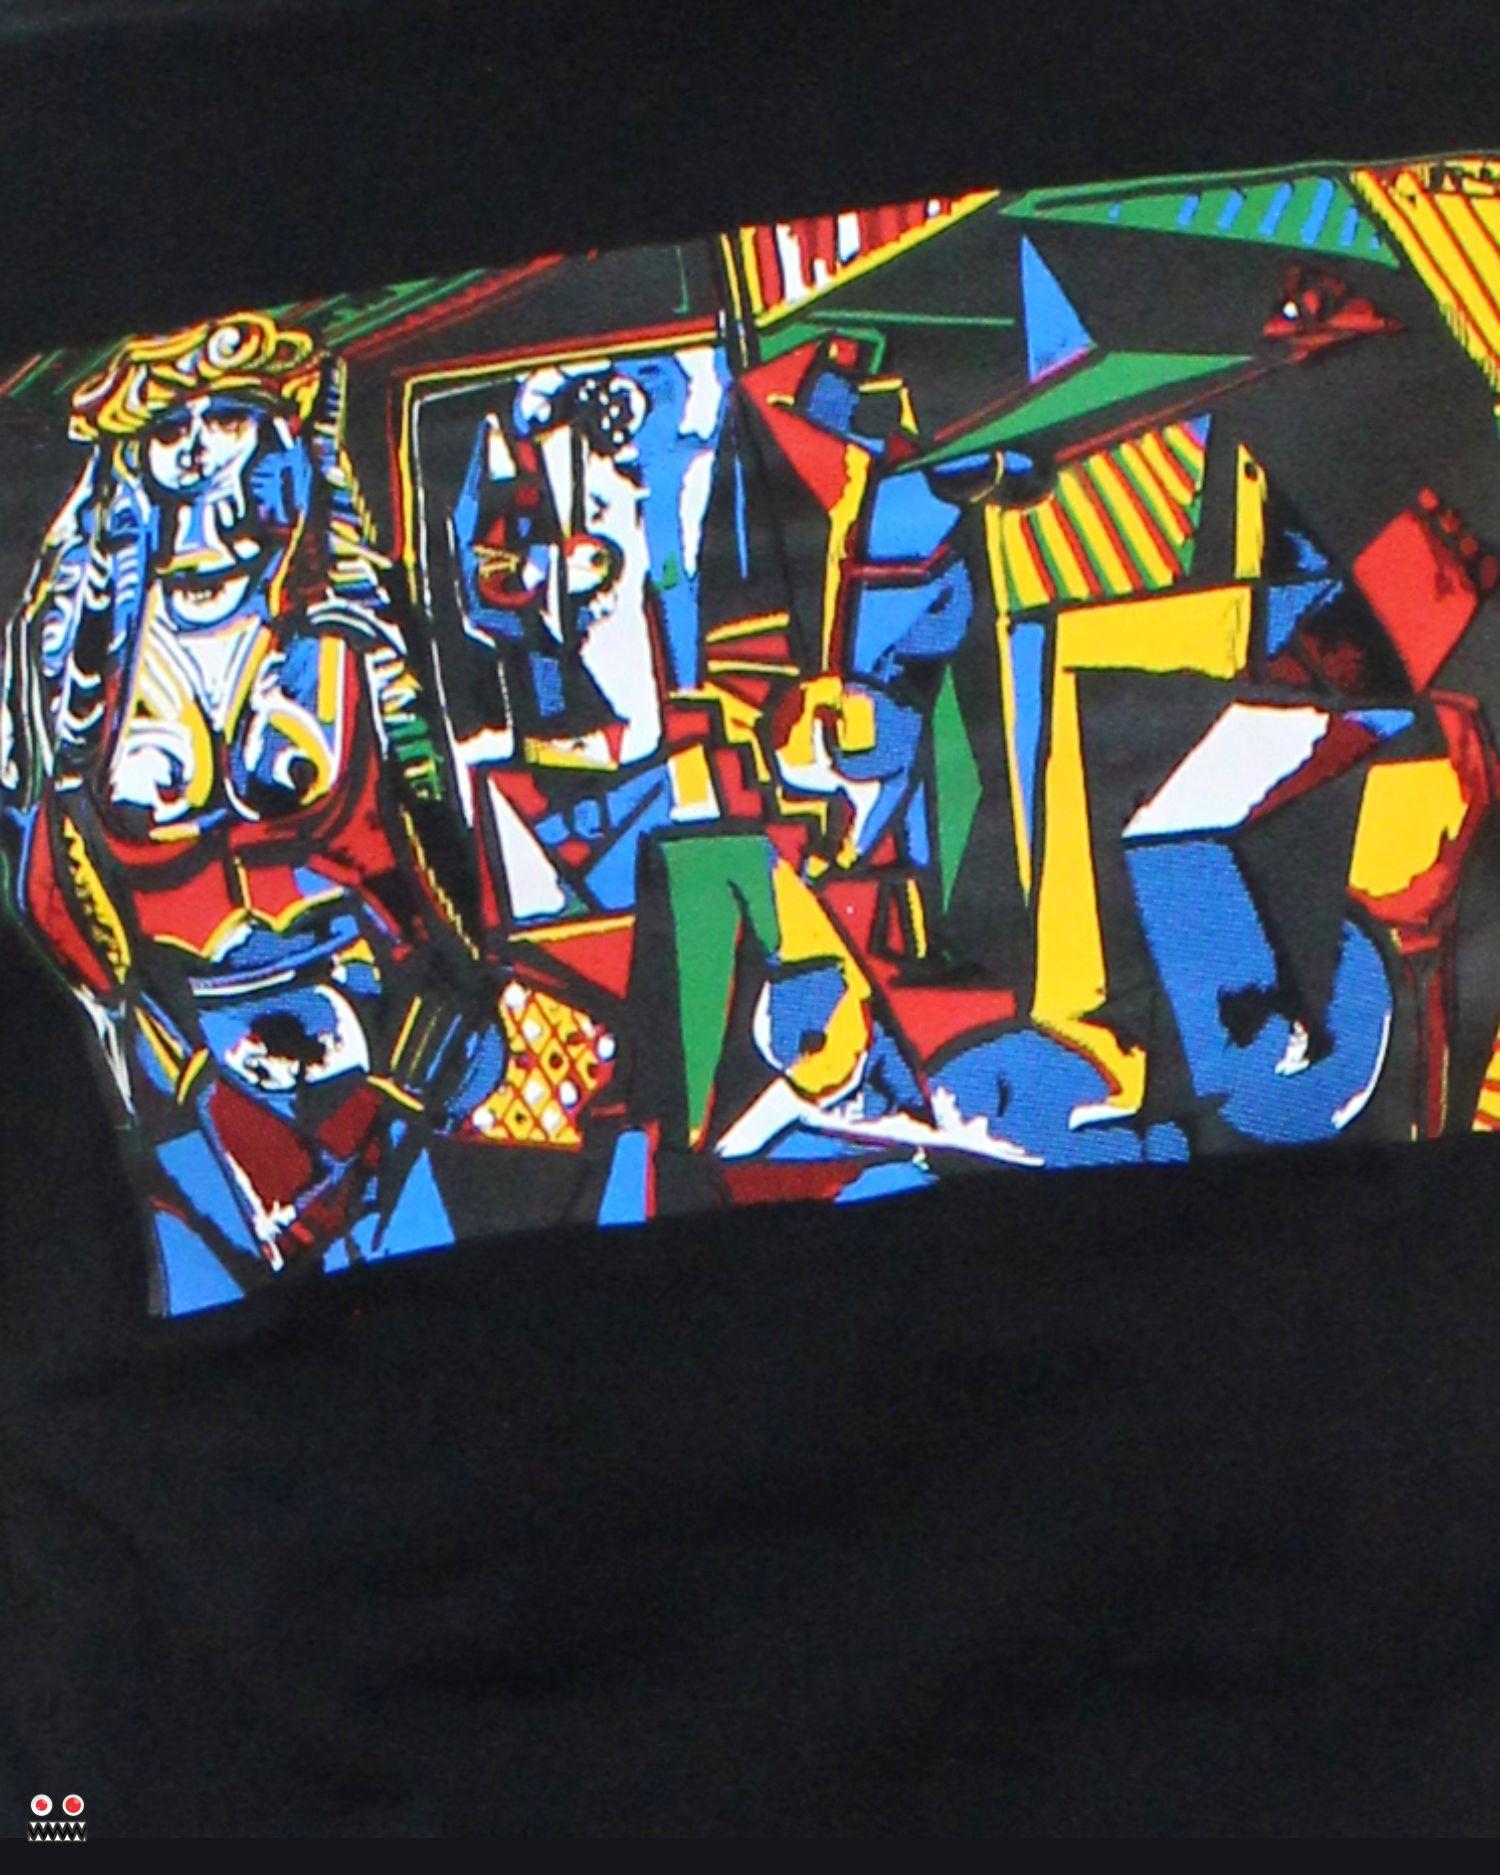 ref 1701 3 camiseta negro cubismo, tela en algodon Tallas S-M-L-XL. $48.000.